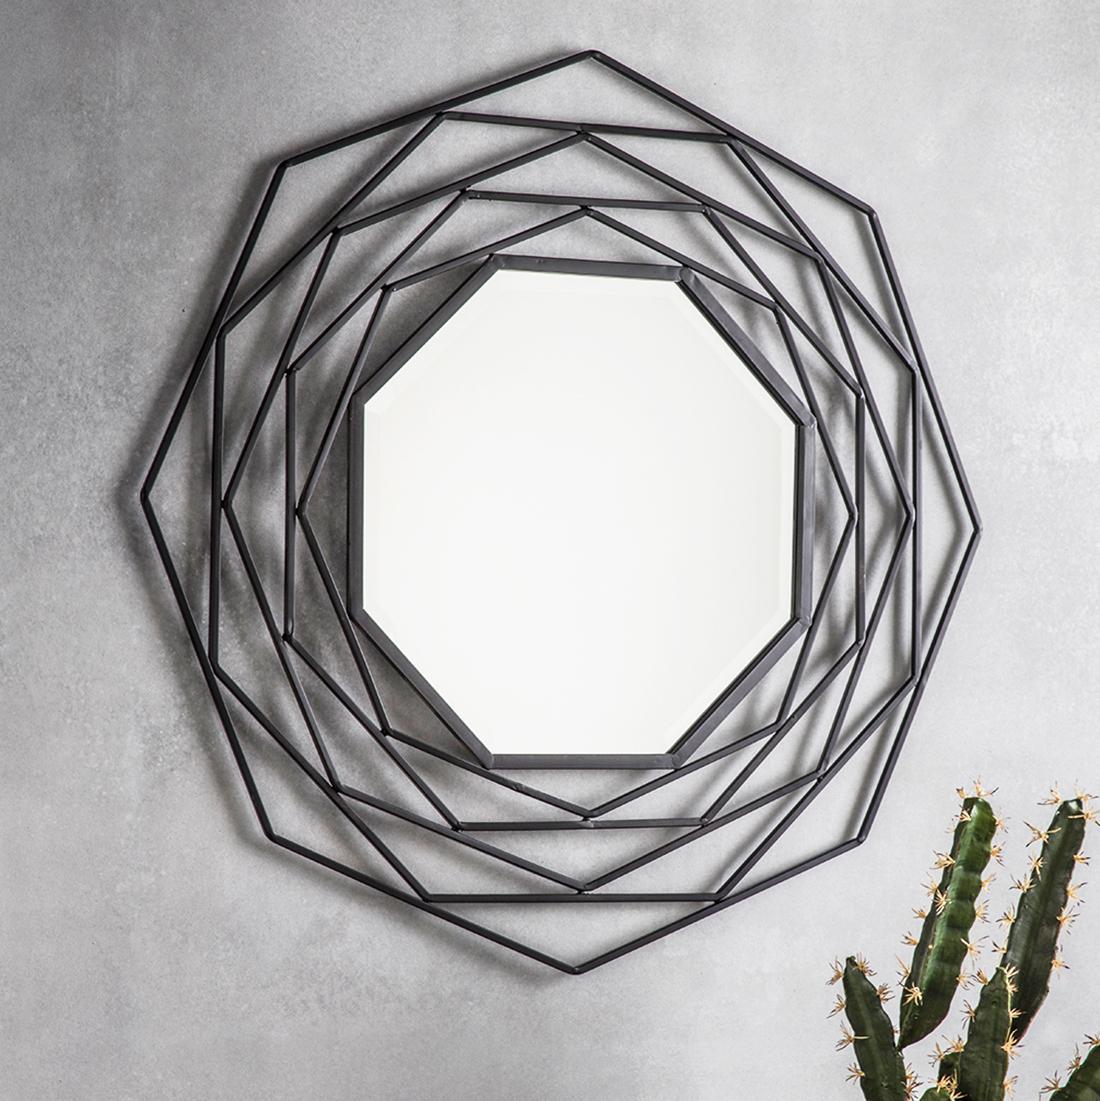 Geometric Wall Mirrors Regarding Well Known Octagonal Black Geometric Wall Mirror (View 6 of 20)